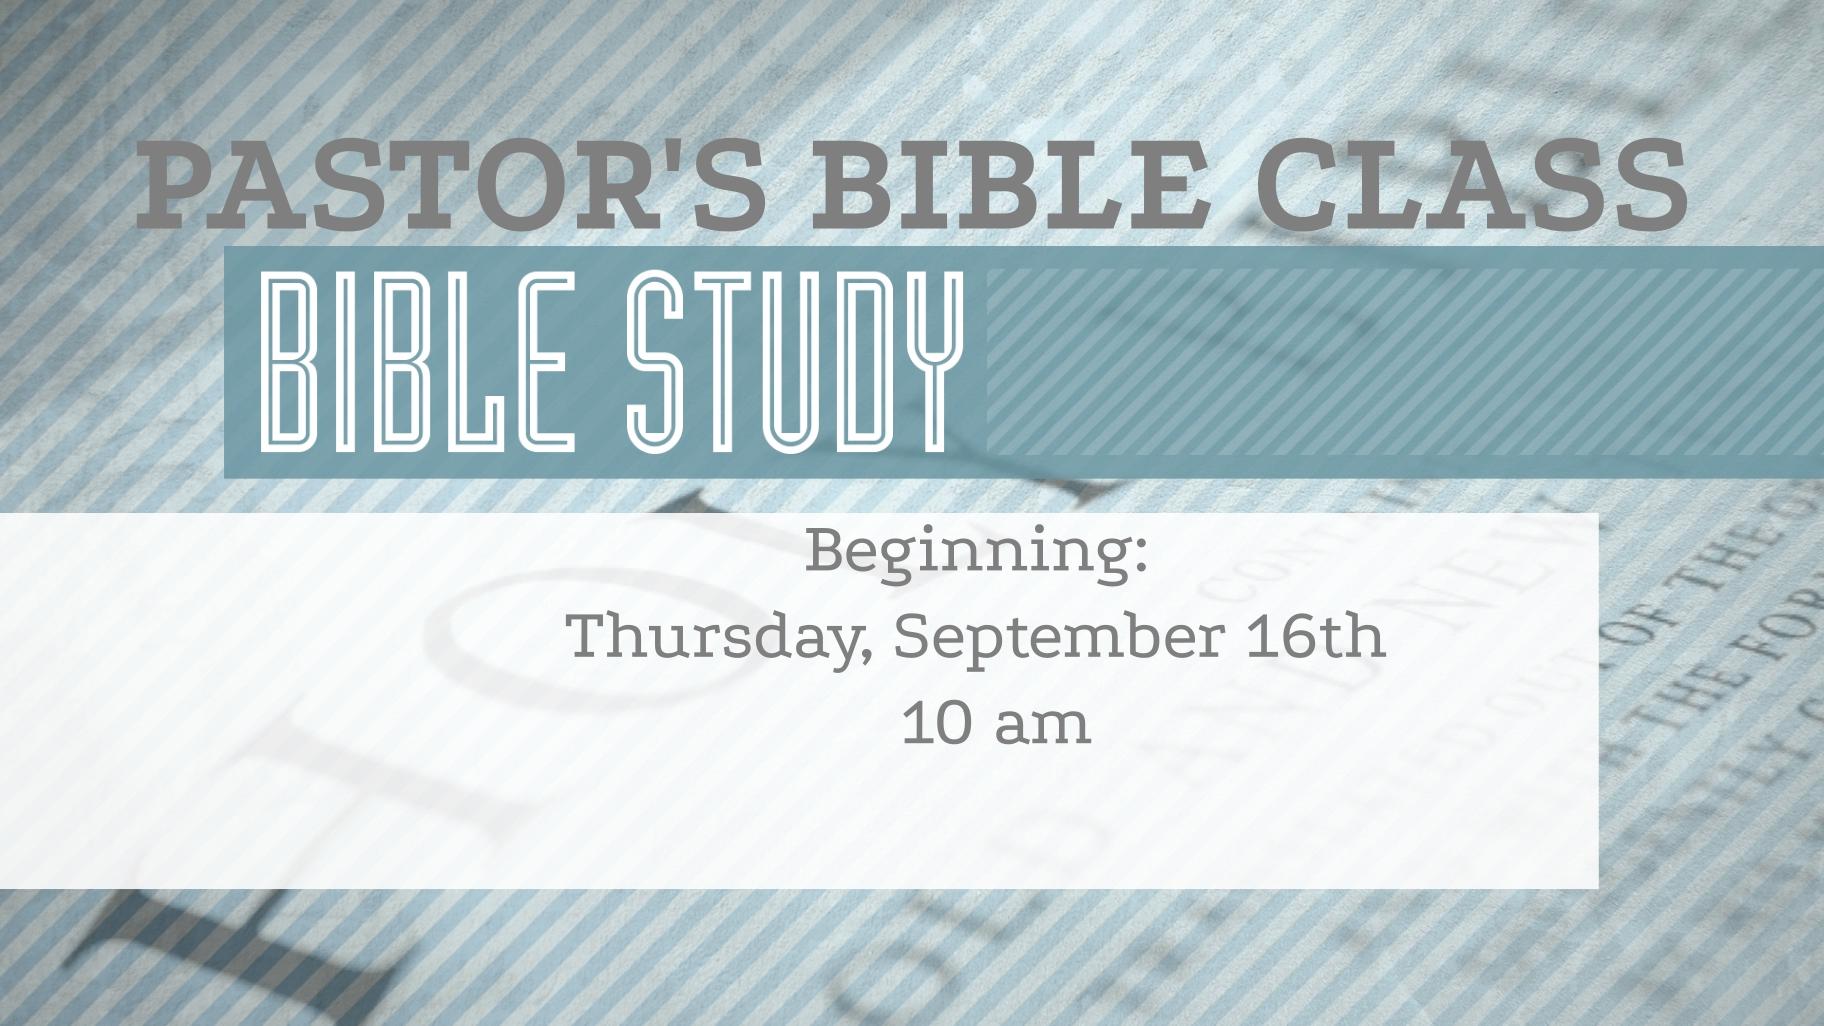 PASTOR'S BIBLE CLASS